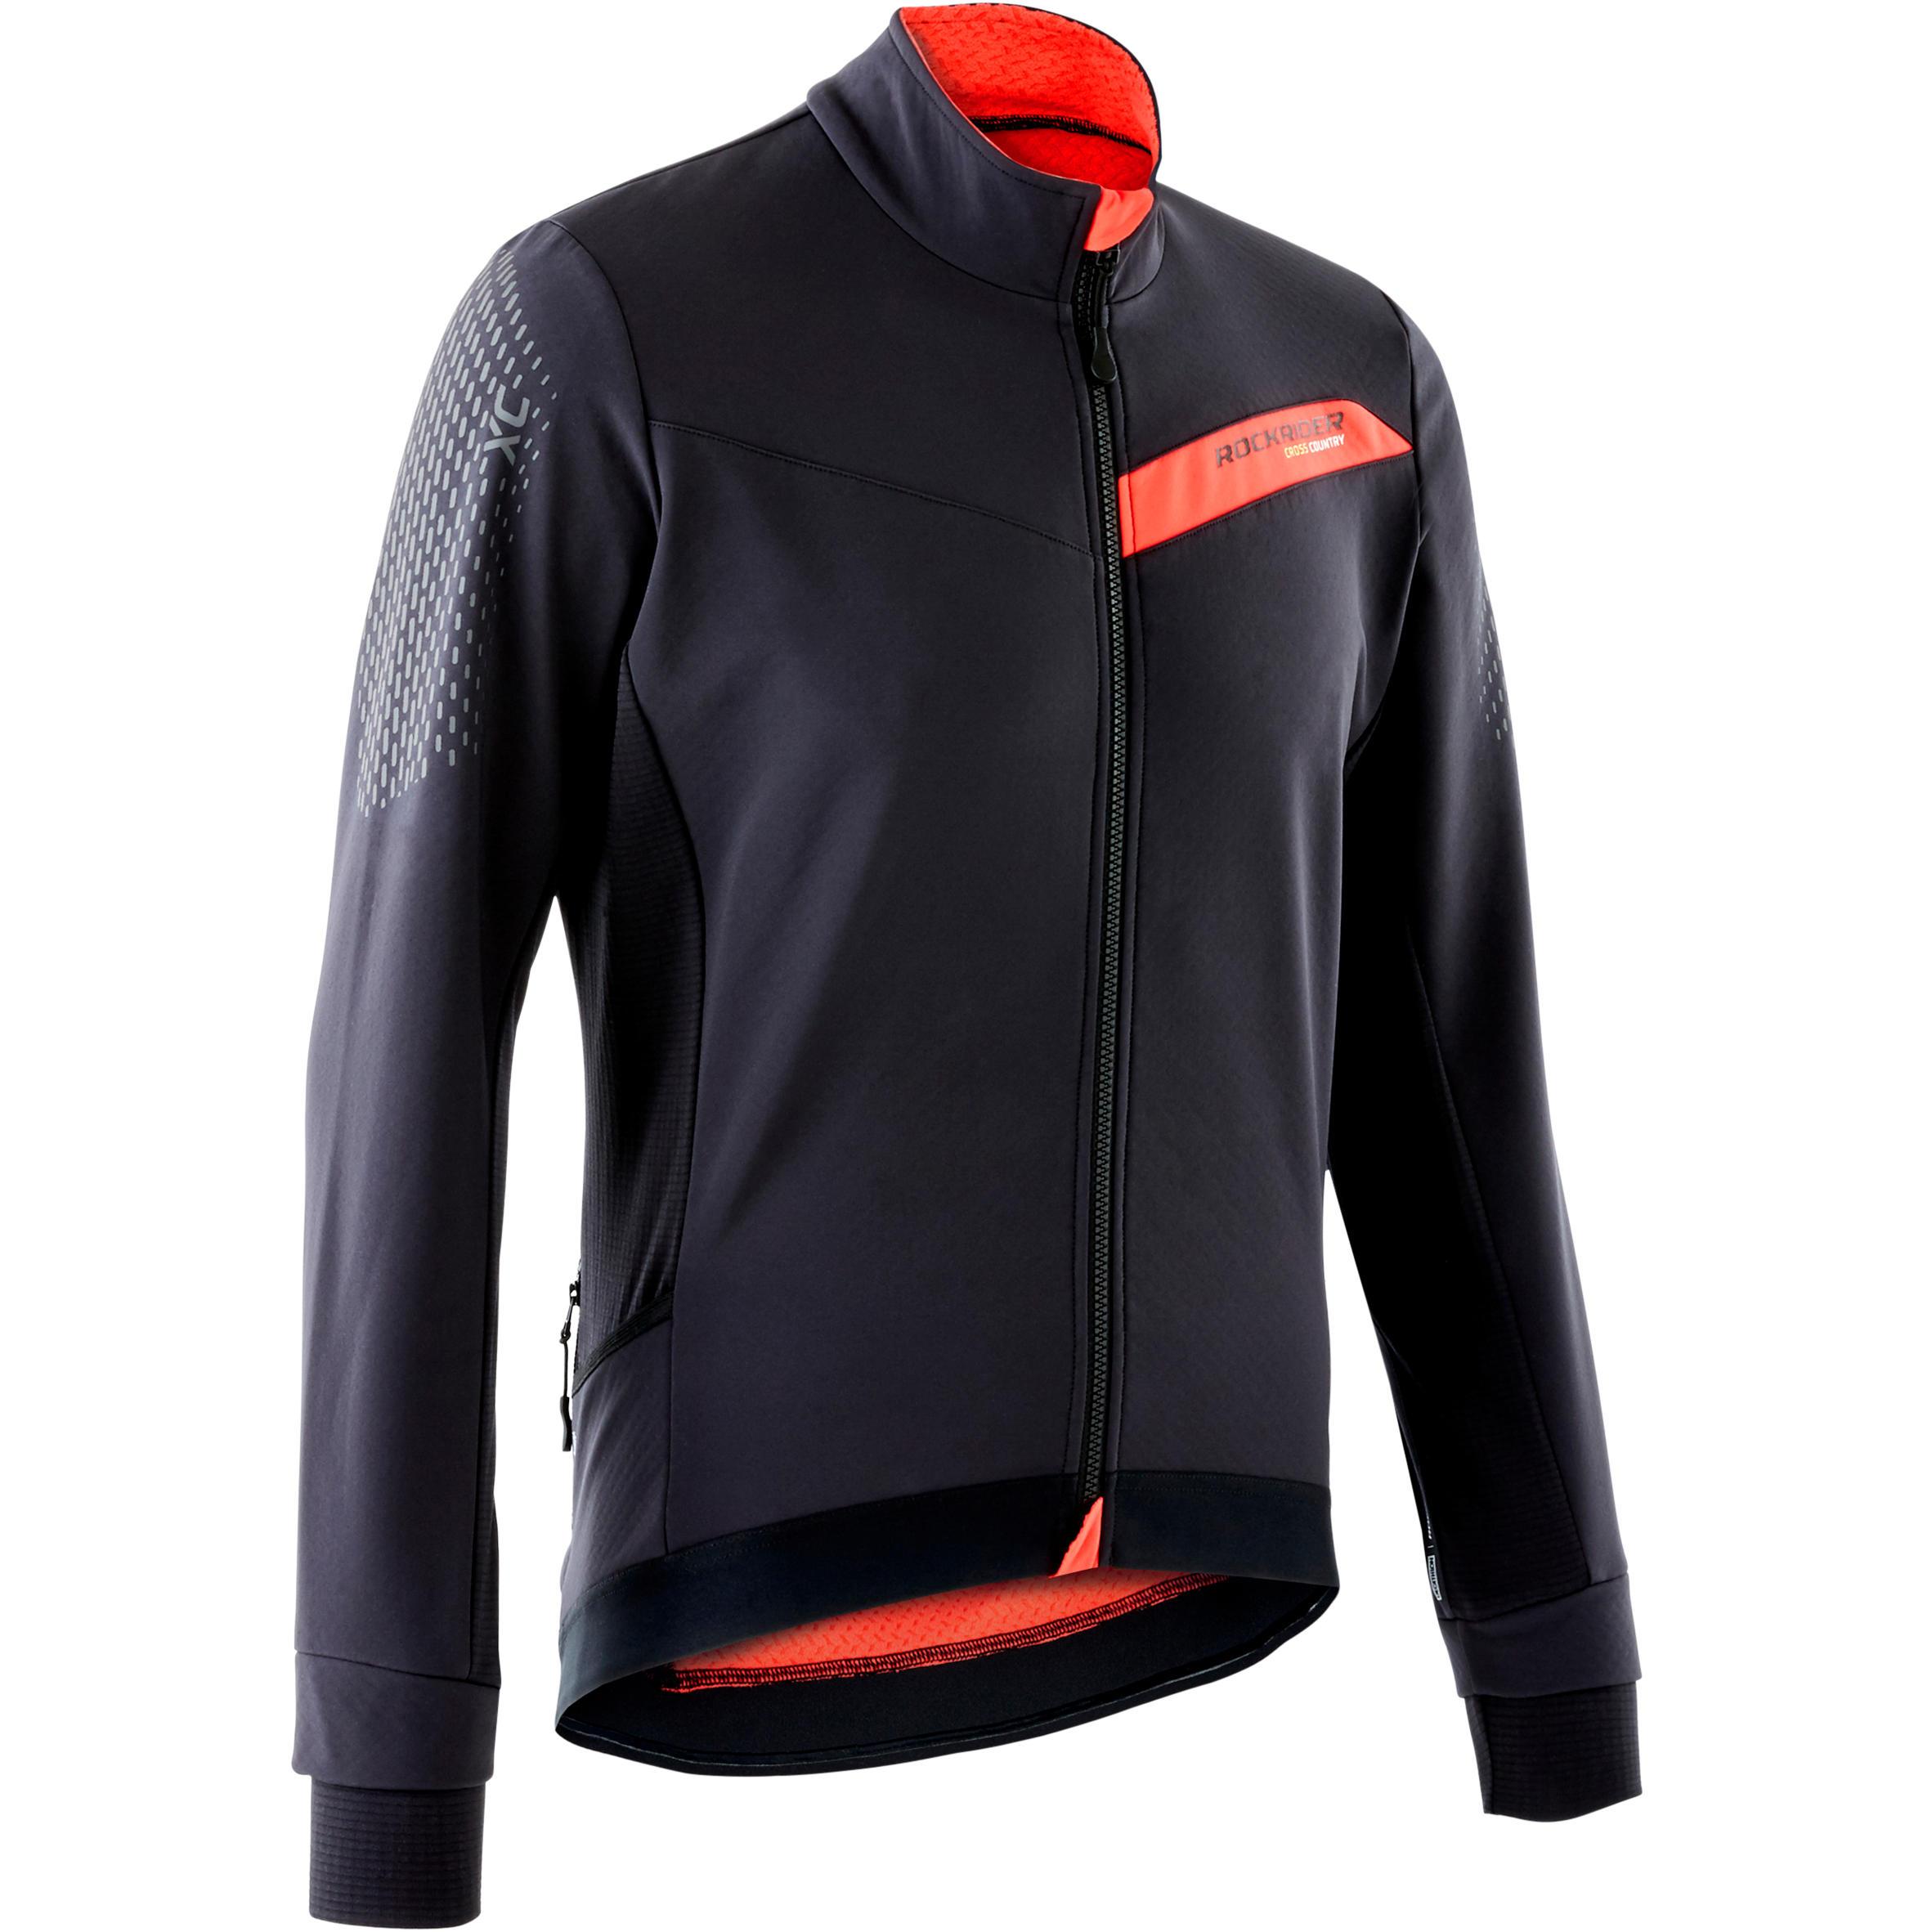 Fahrradjacke MTB XC Slim Fit | Sportbekleidung | Rockrider